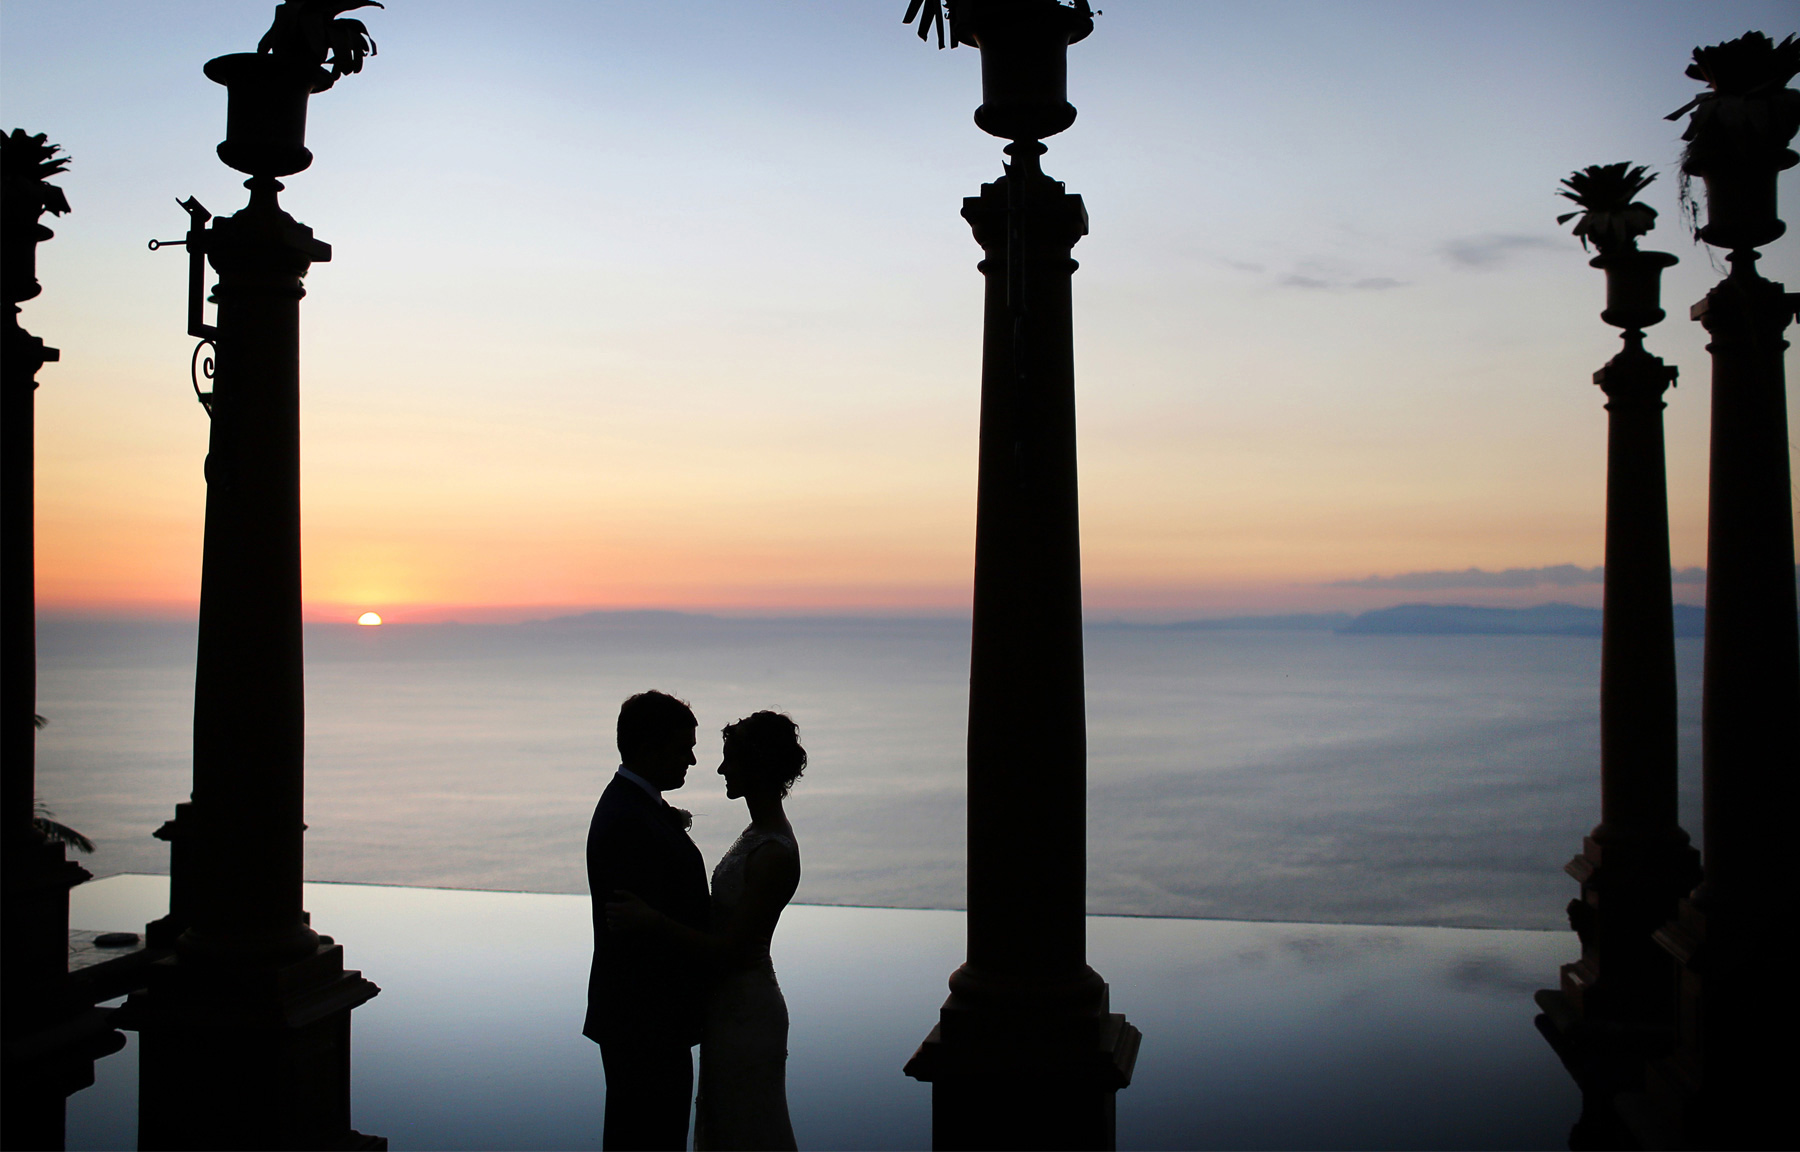 19-Costa-Rica-Wedding-Photography-by-Vick-Photography-Jaco-Island-Villa-Caletas-Resort-Ocean-View-Sunset-Alli-and-Duncan.jpg